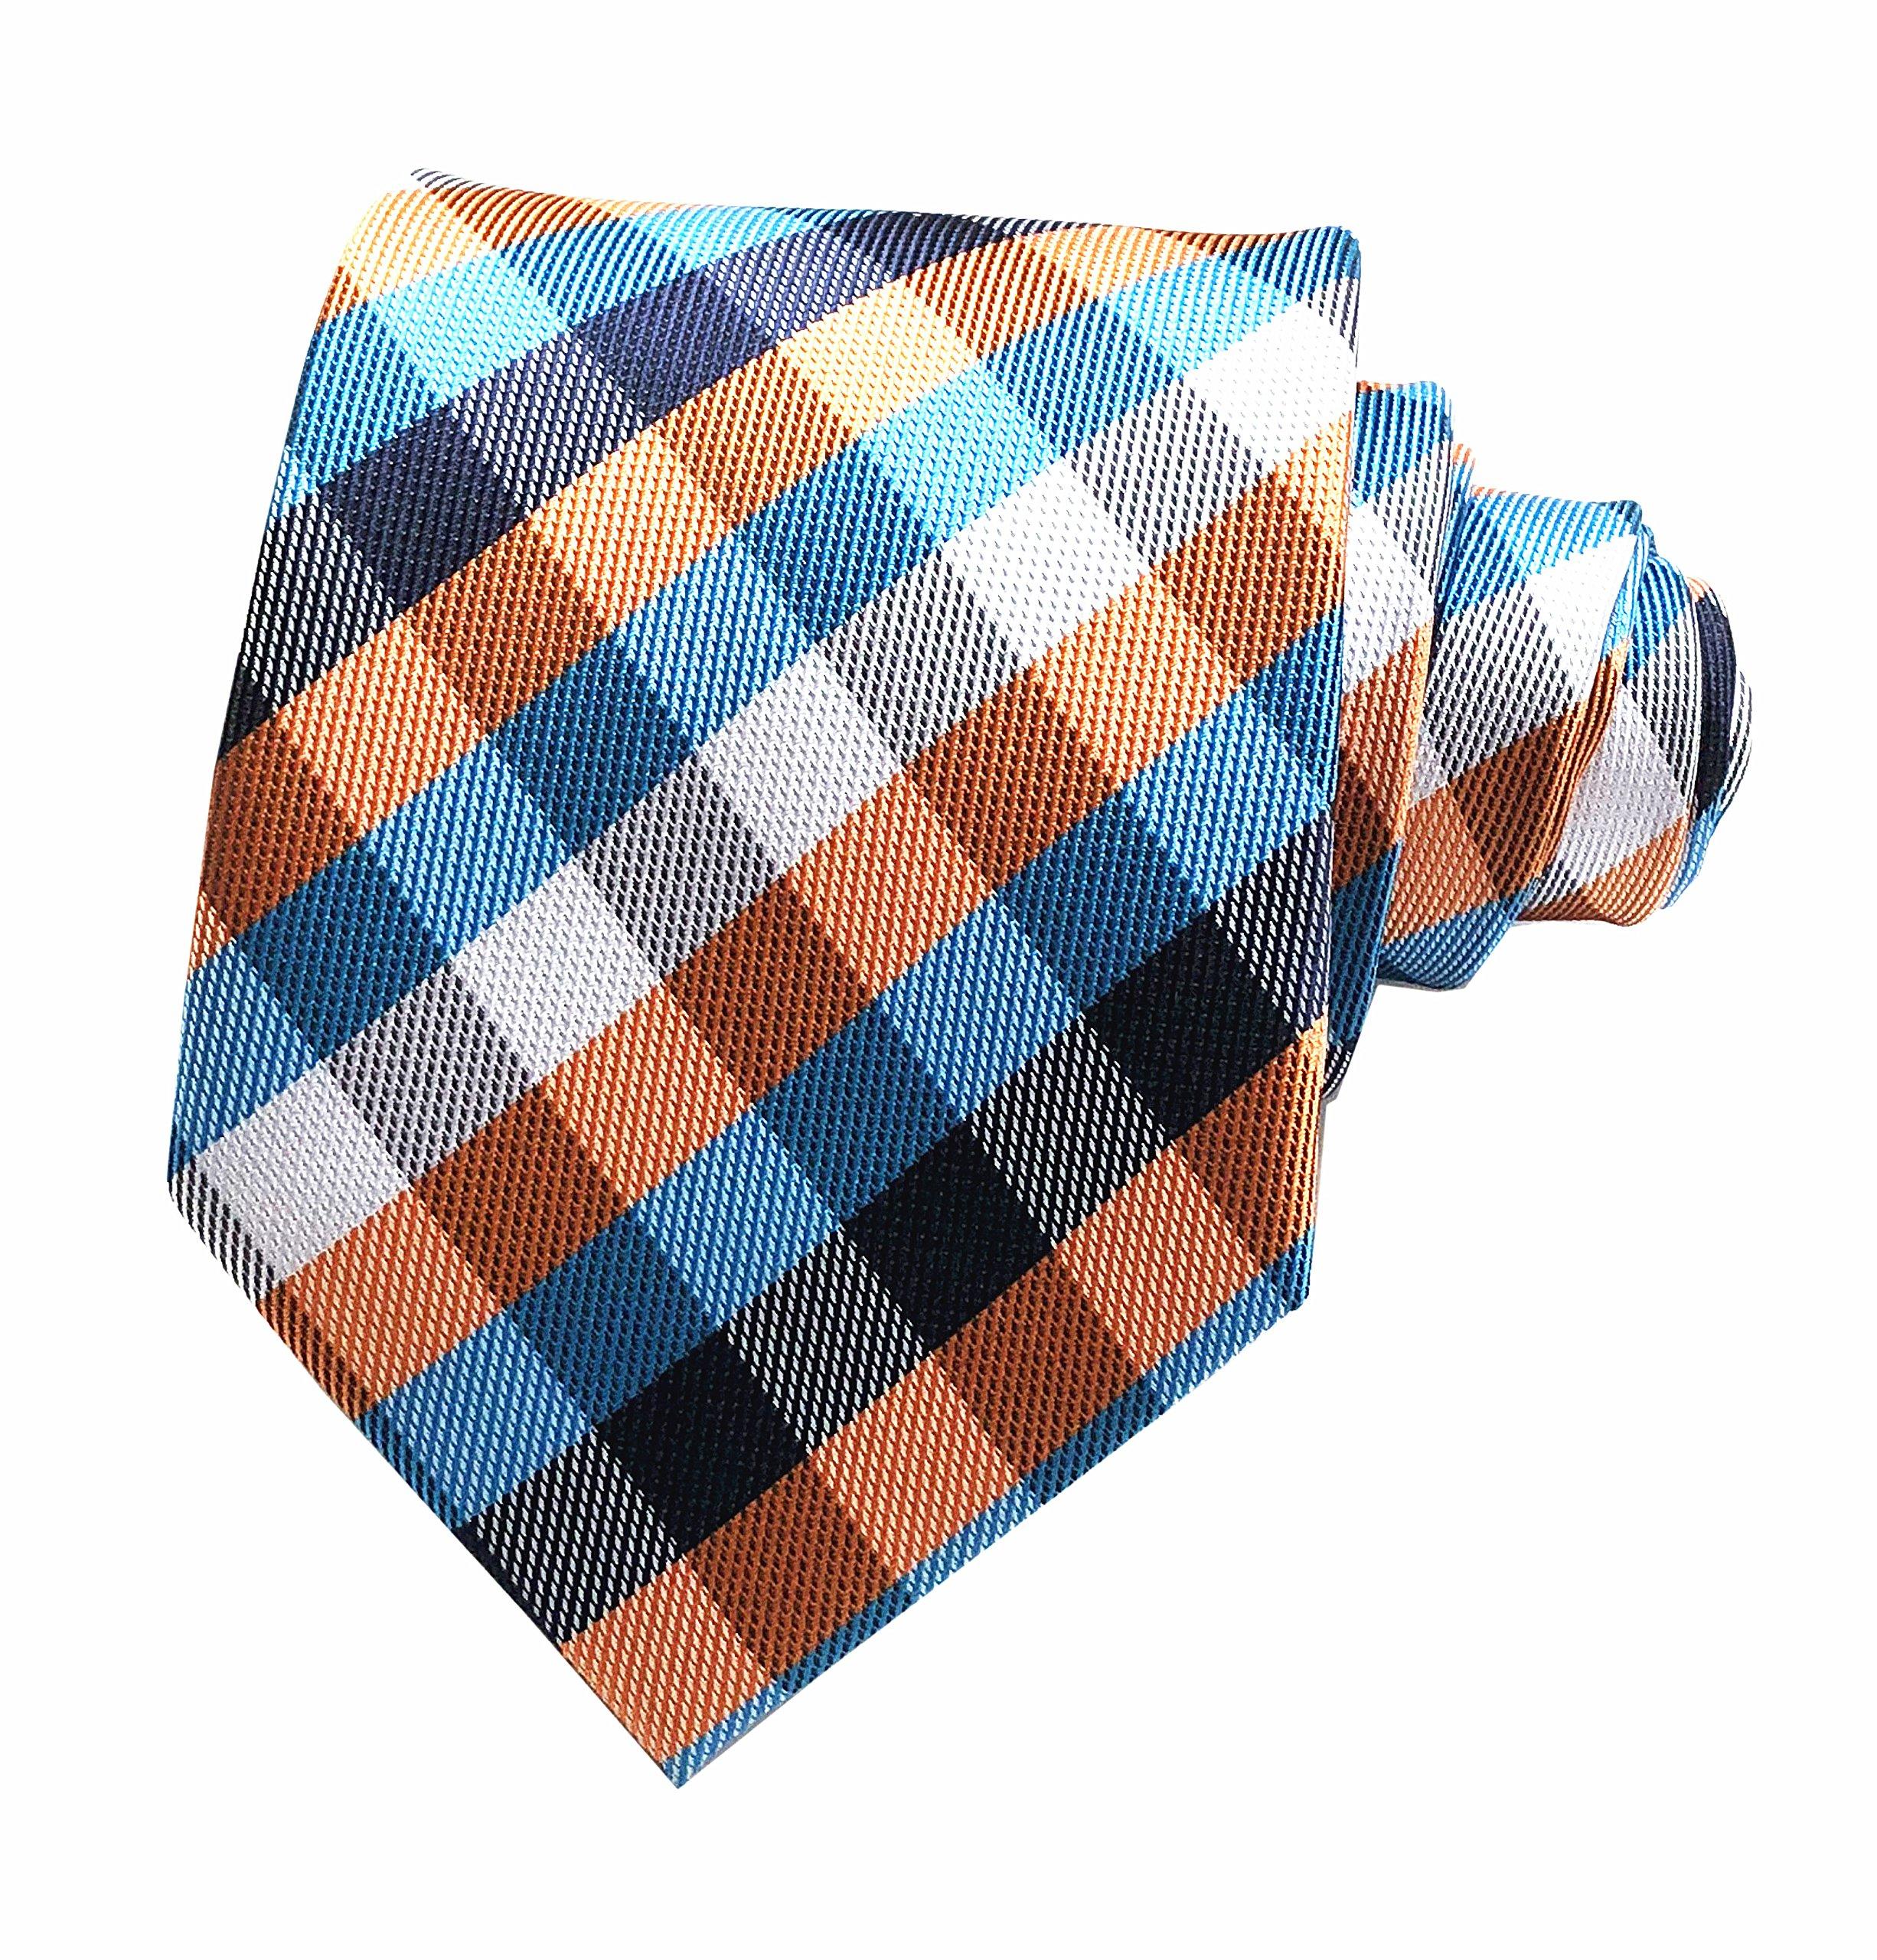 Secdtie Men's Slim Check Stripe Silk Ties Jacquard Formal Plaid Necktie for Gift (One Size, Blue Orange)